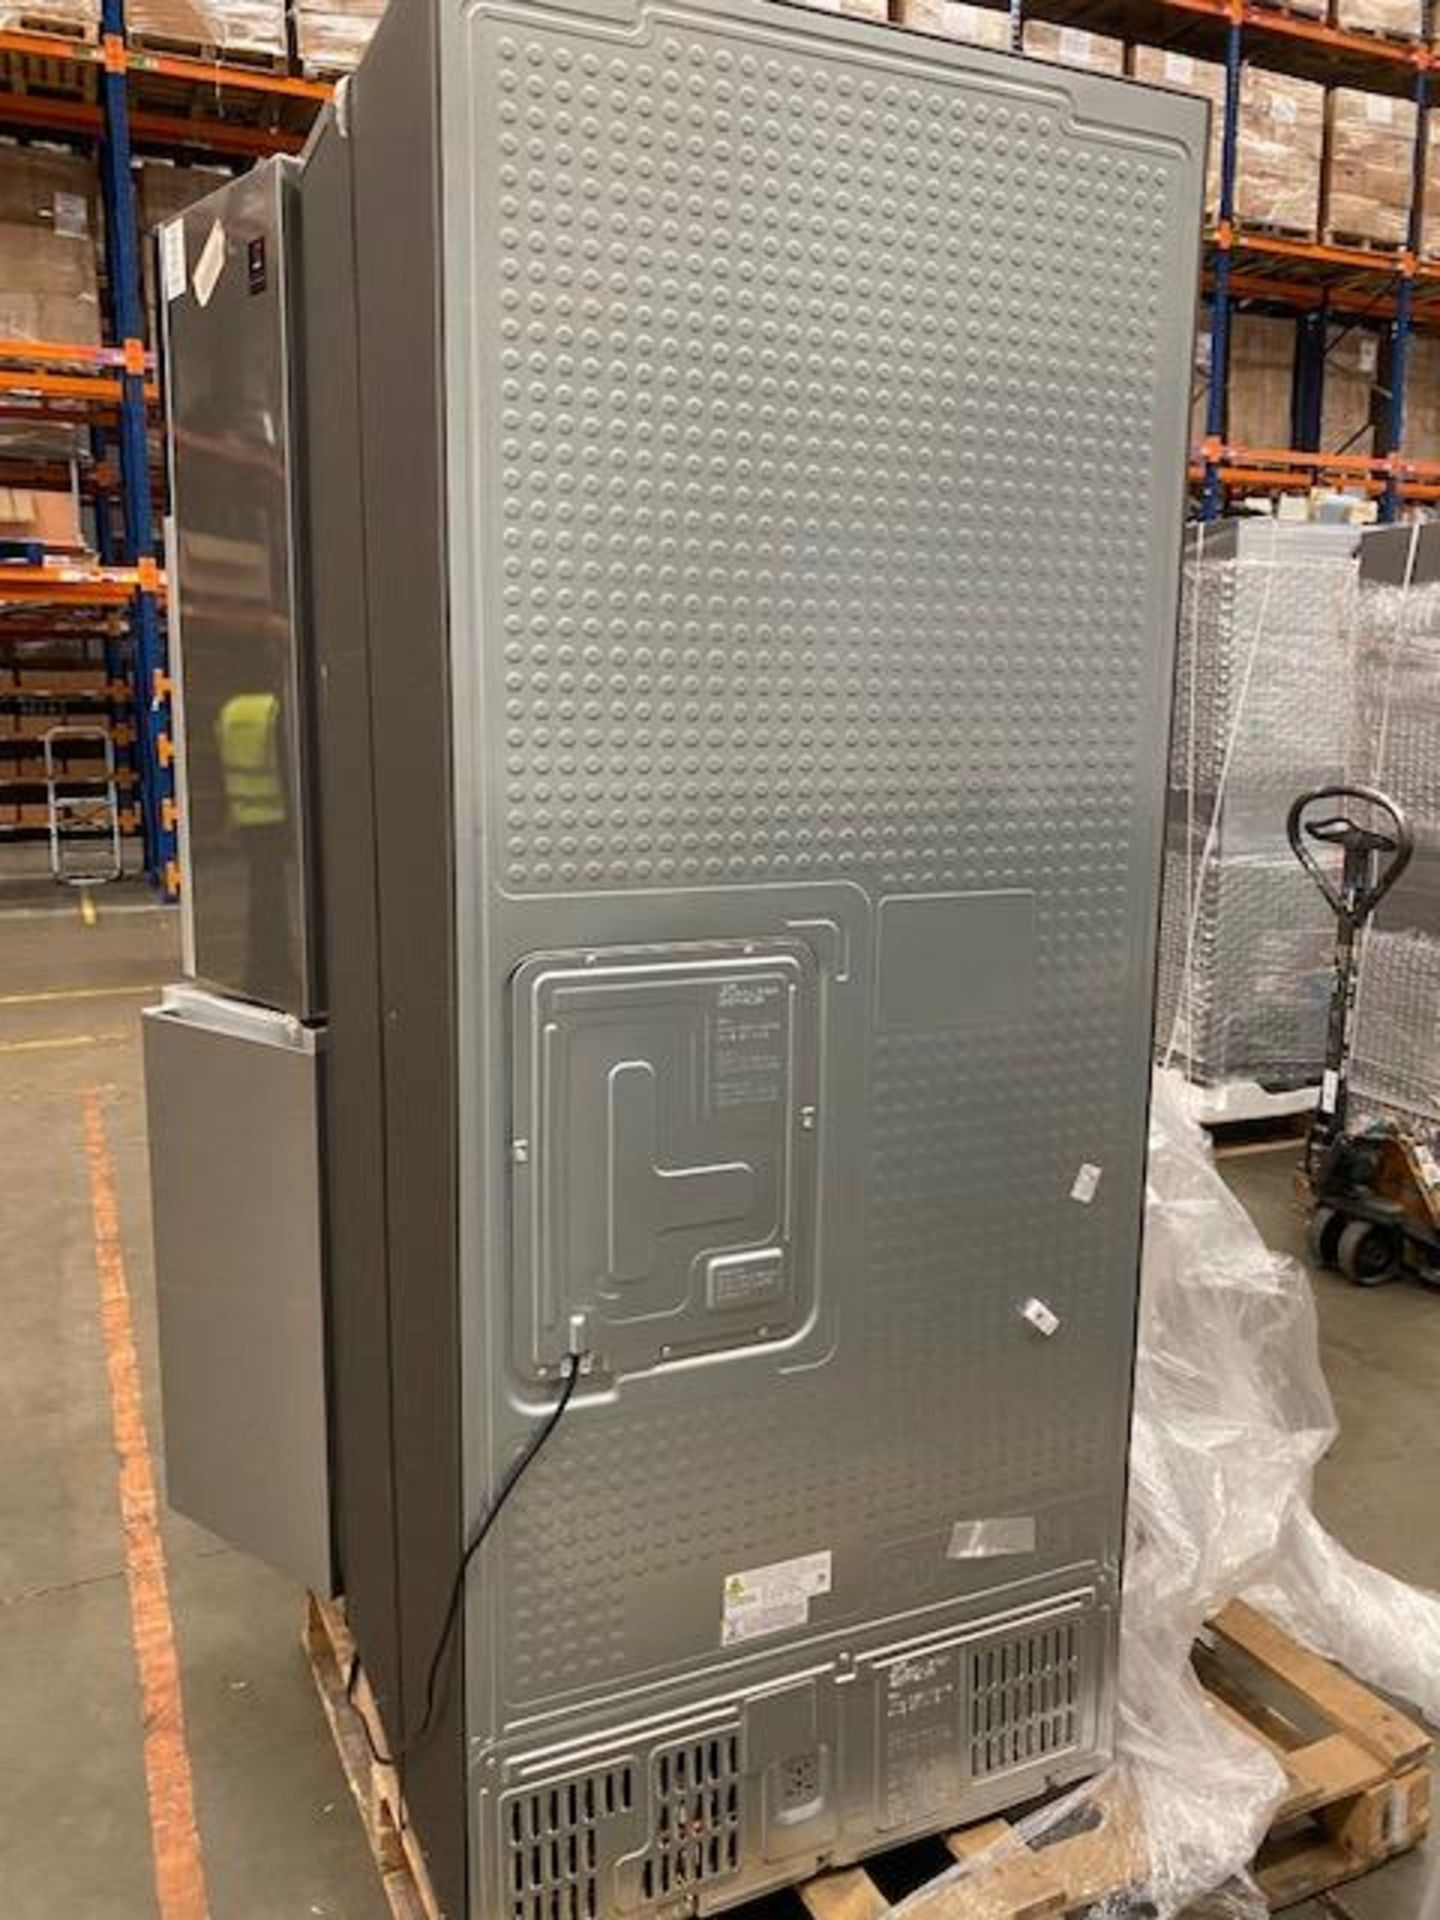 Pallet of 1 Samsung SLIM MULTI DOOR. Latest Selling Price £1,499.99 - Image 8 of 8